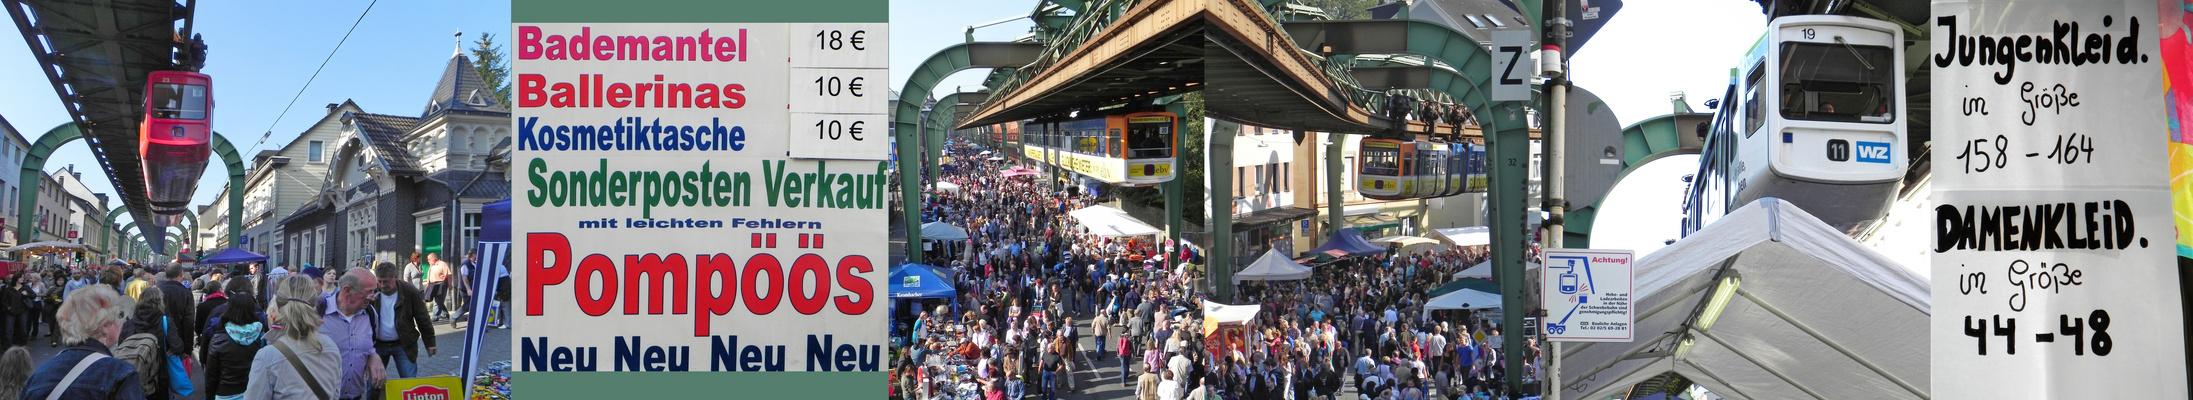 Flohmarkt W.tal-Vohwinkel